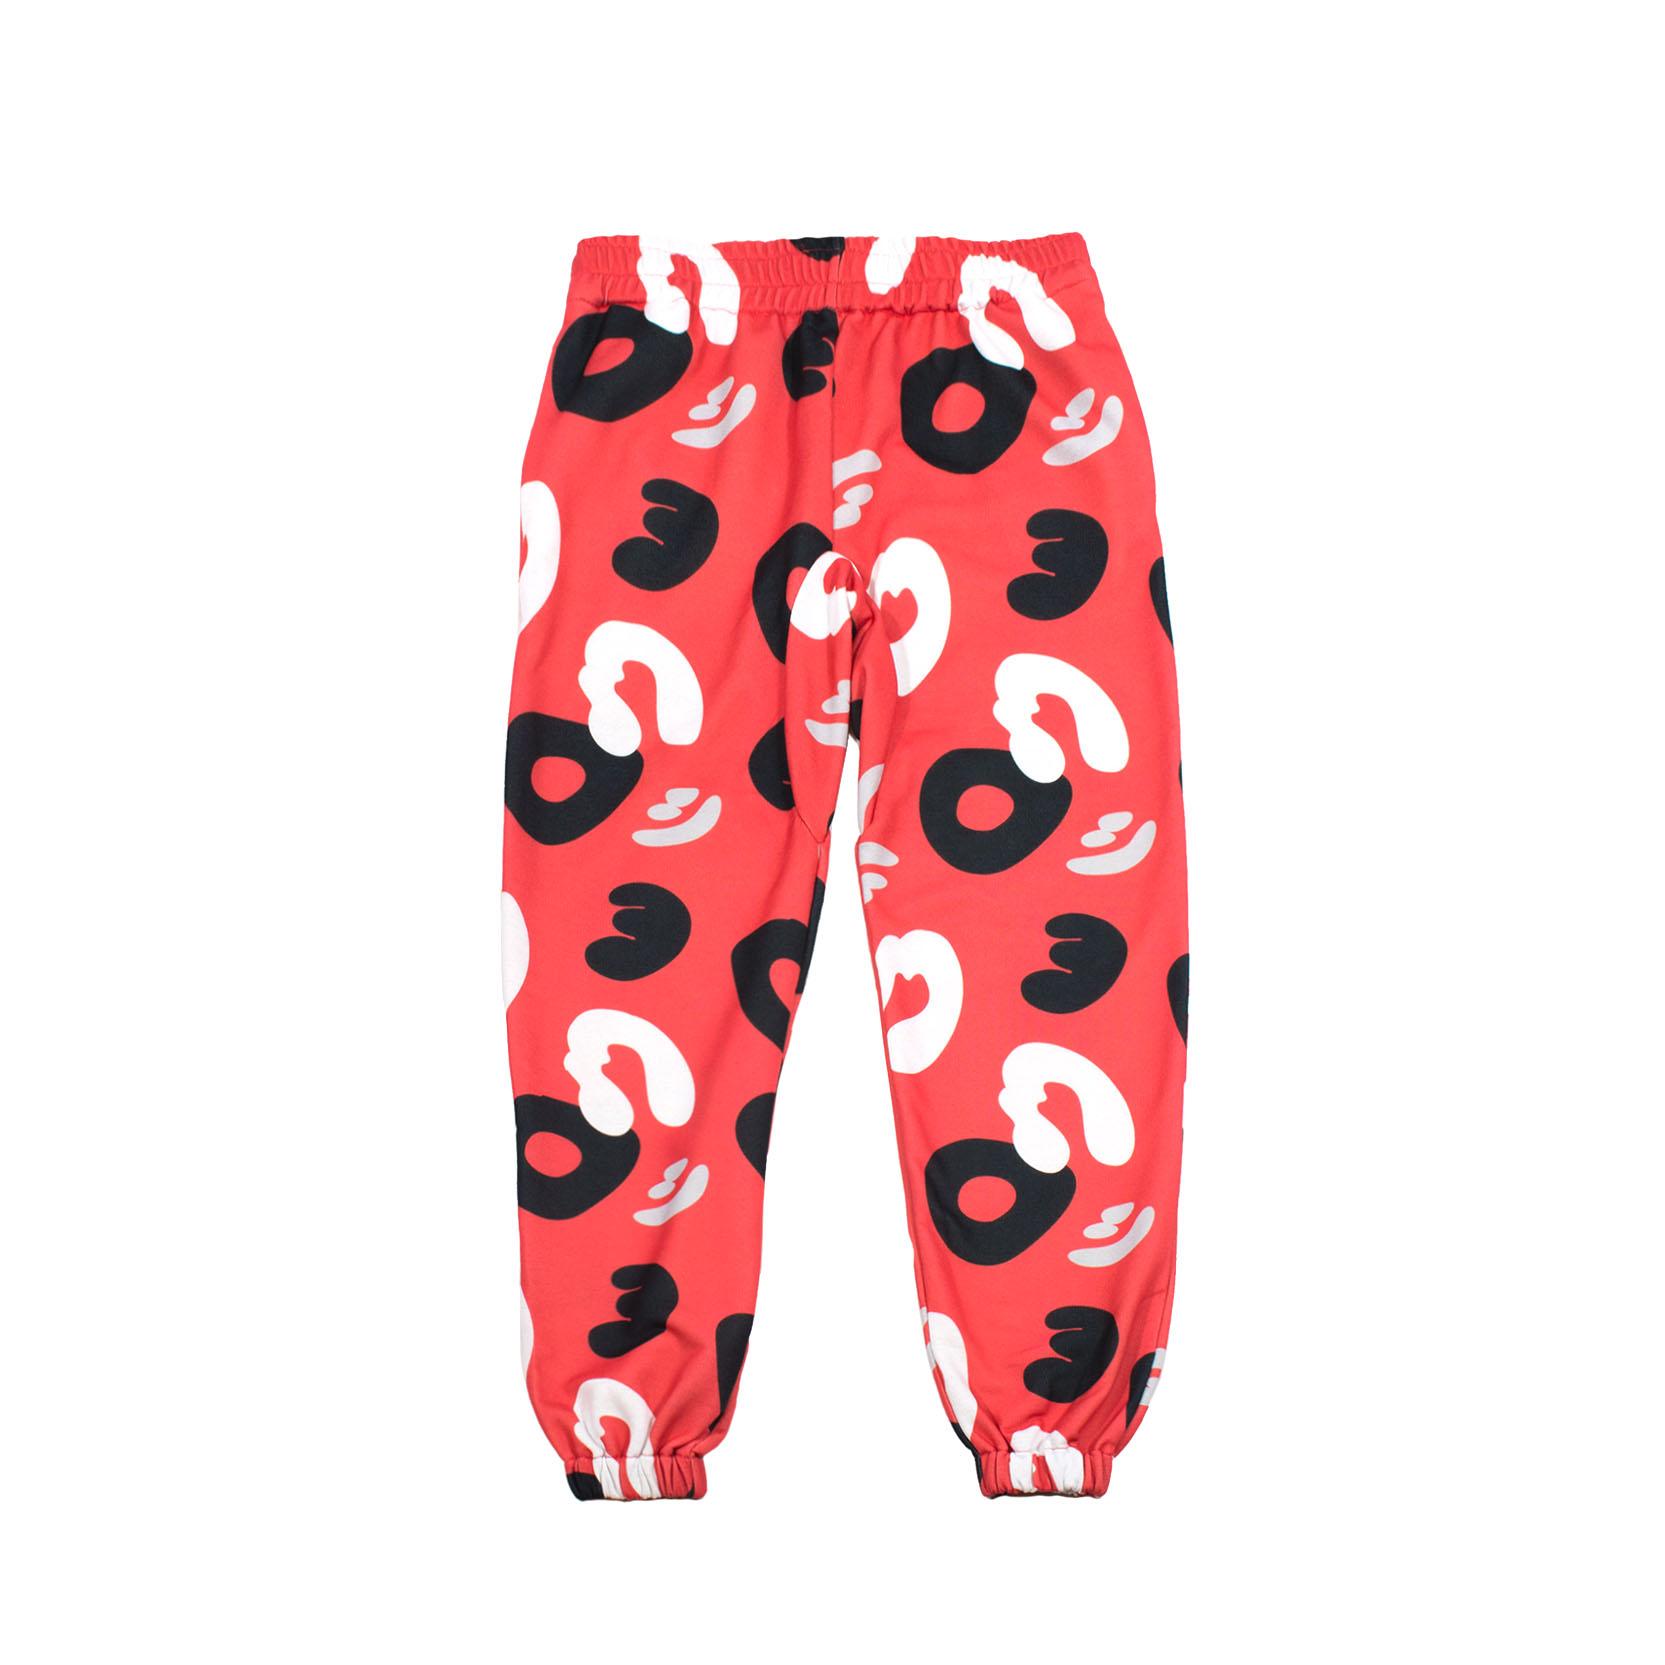 Red Camo Joggers Sweatpants #PowerCamo - front